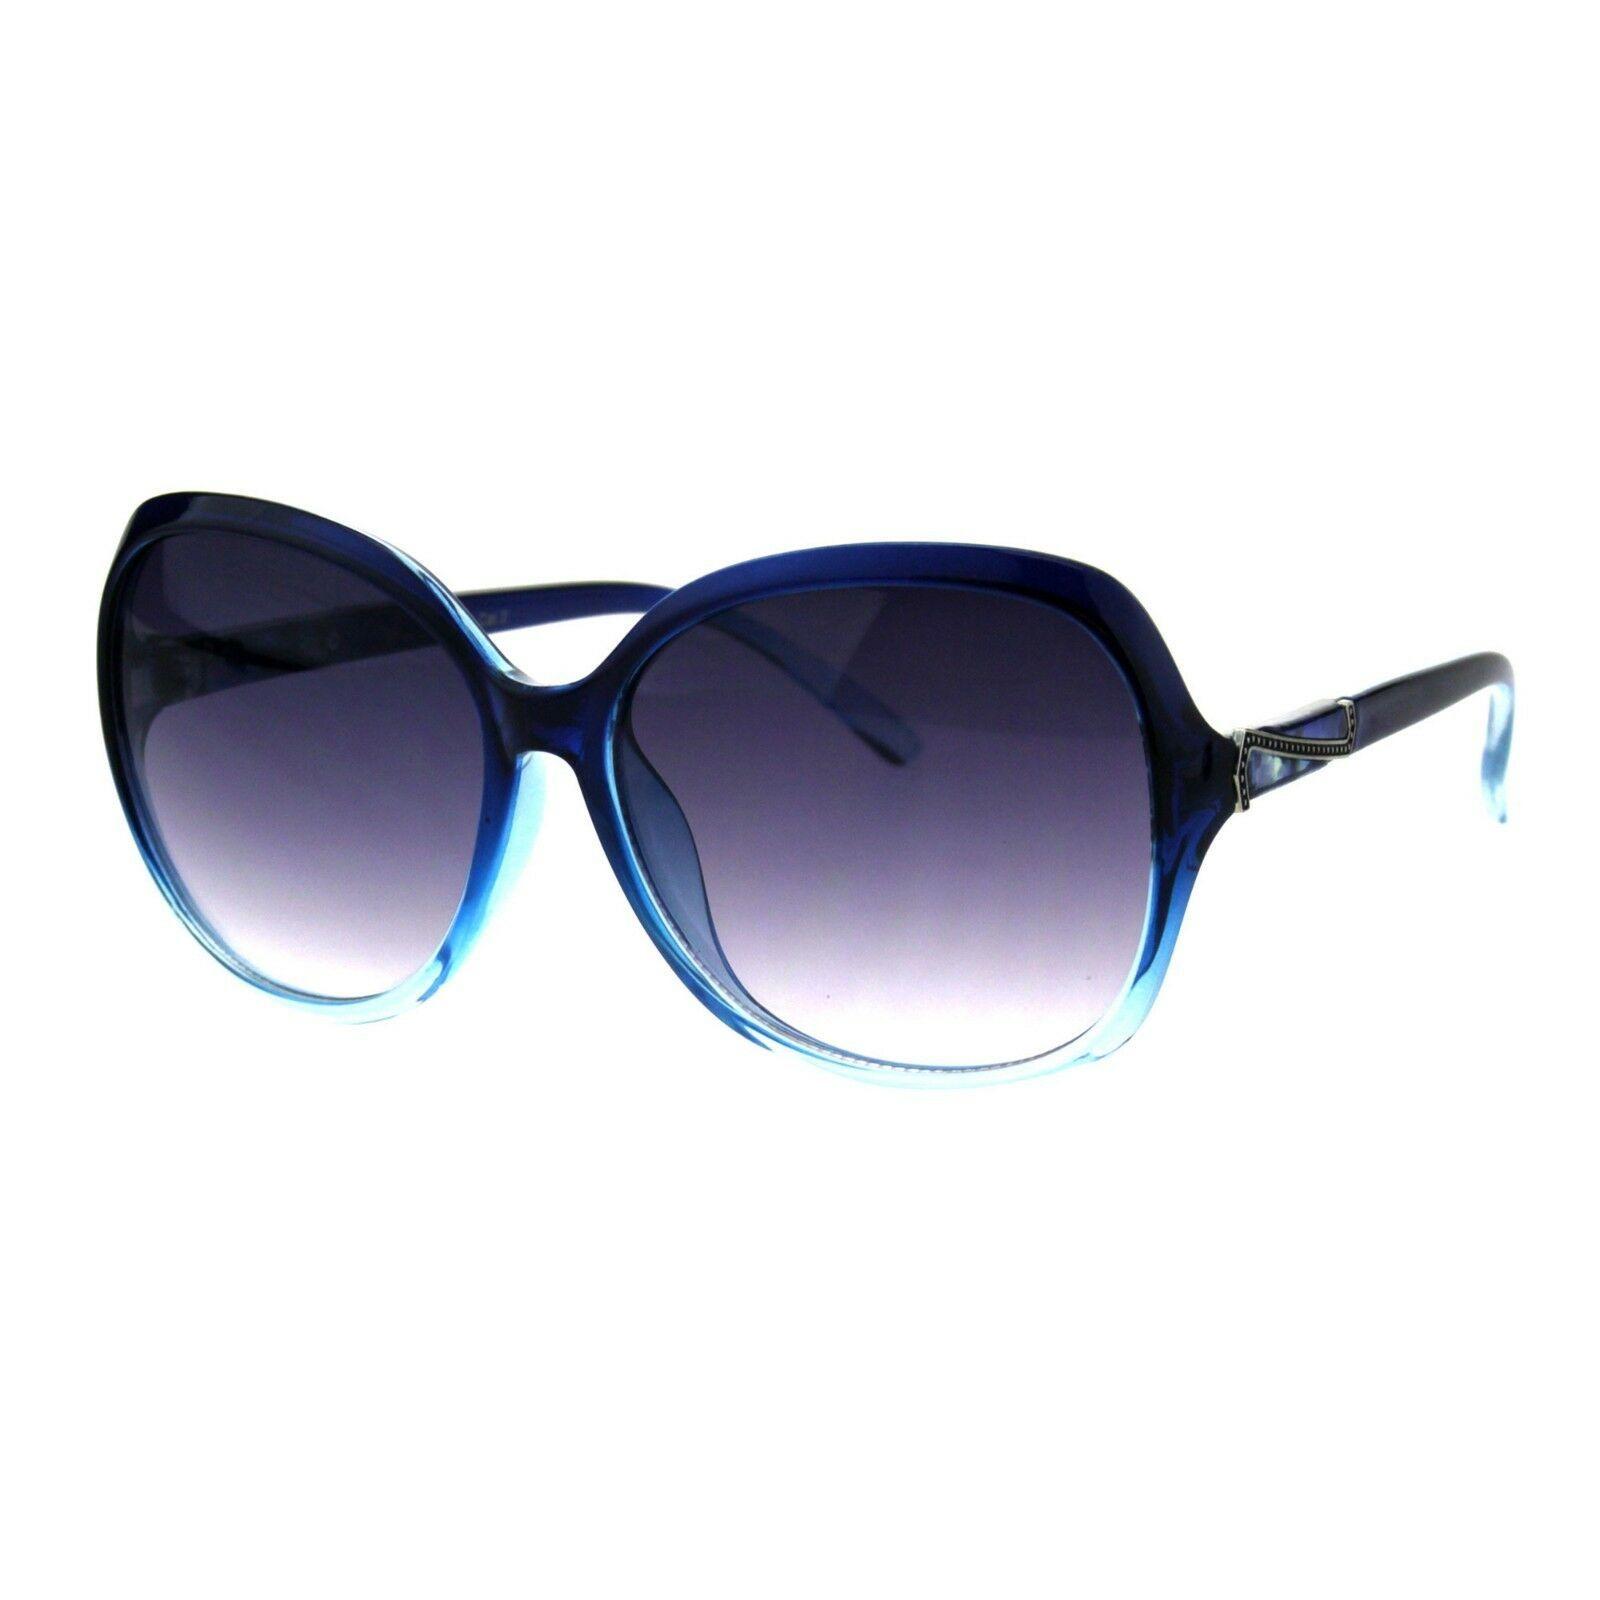 Round Square Sunglasses Womens Designer Style Classy Shades UV 400